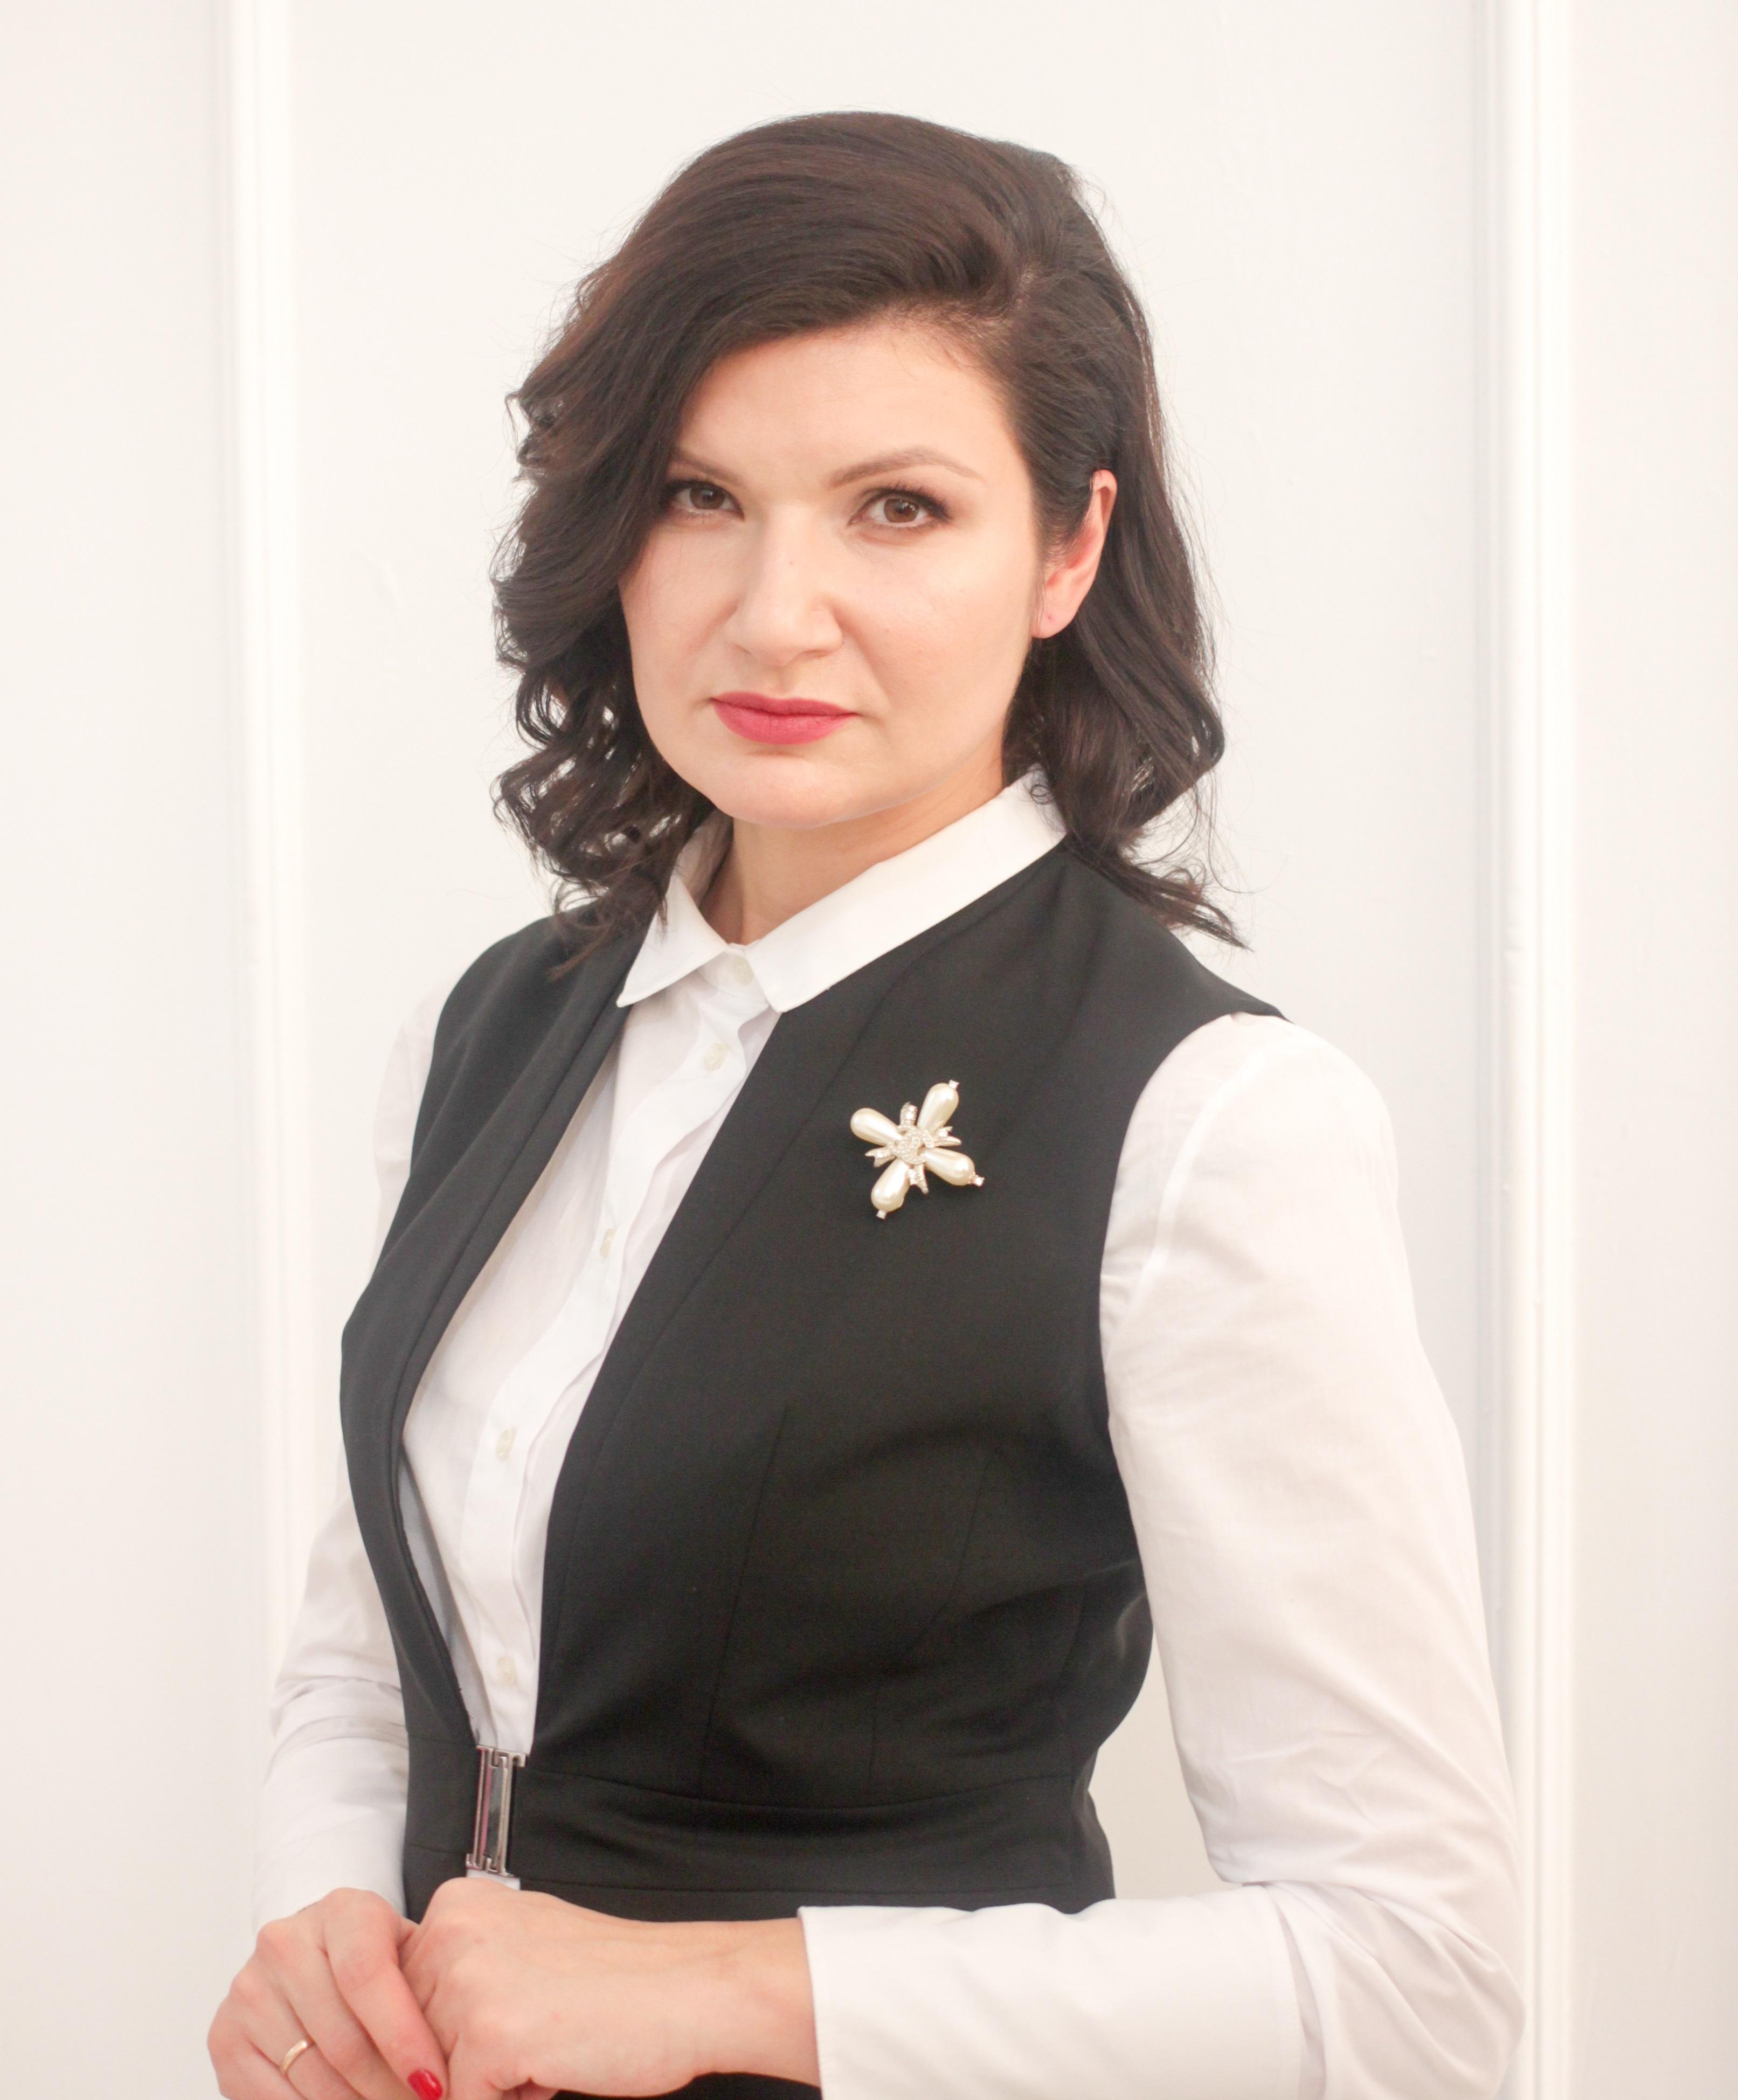 Жанна Дмитриева. Бизнес-тренер